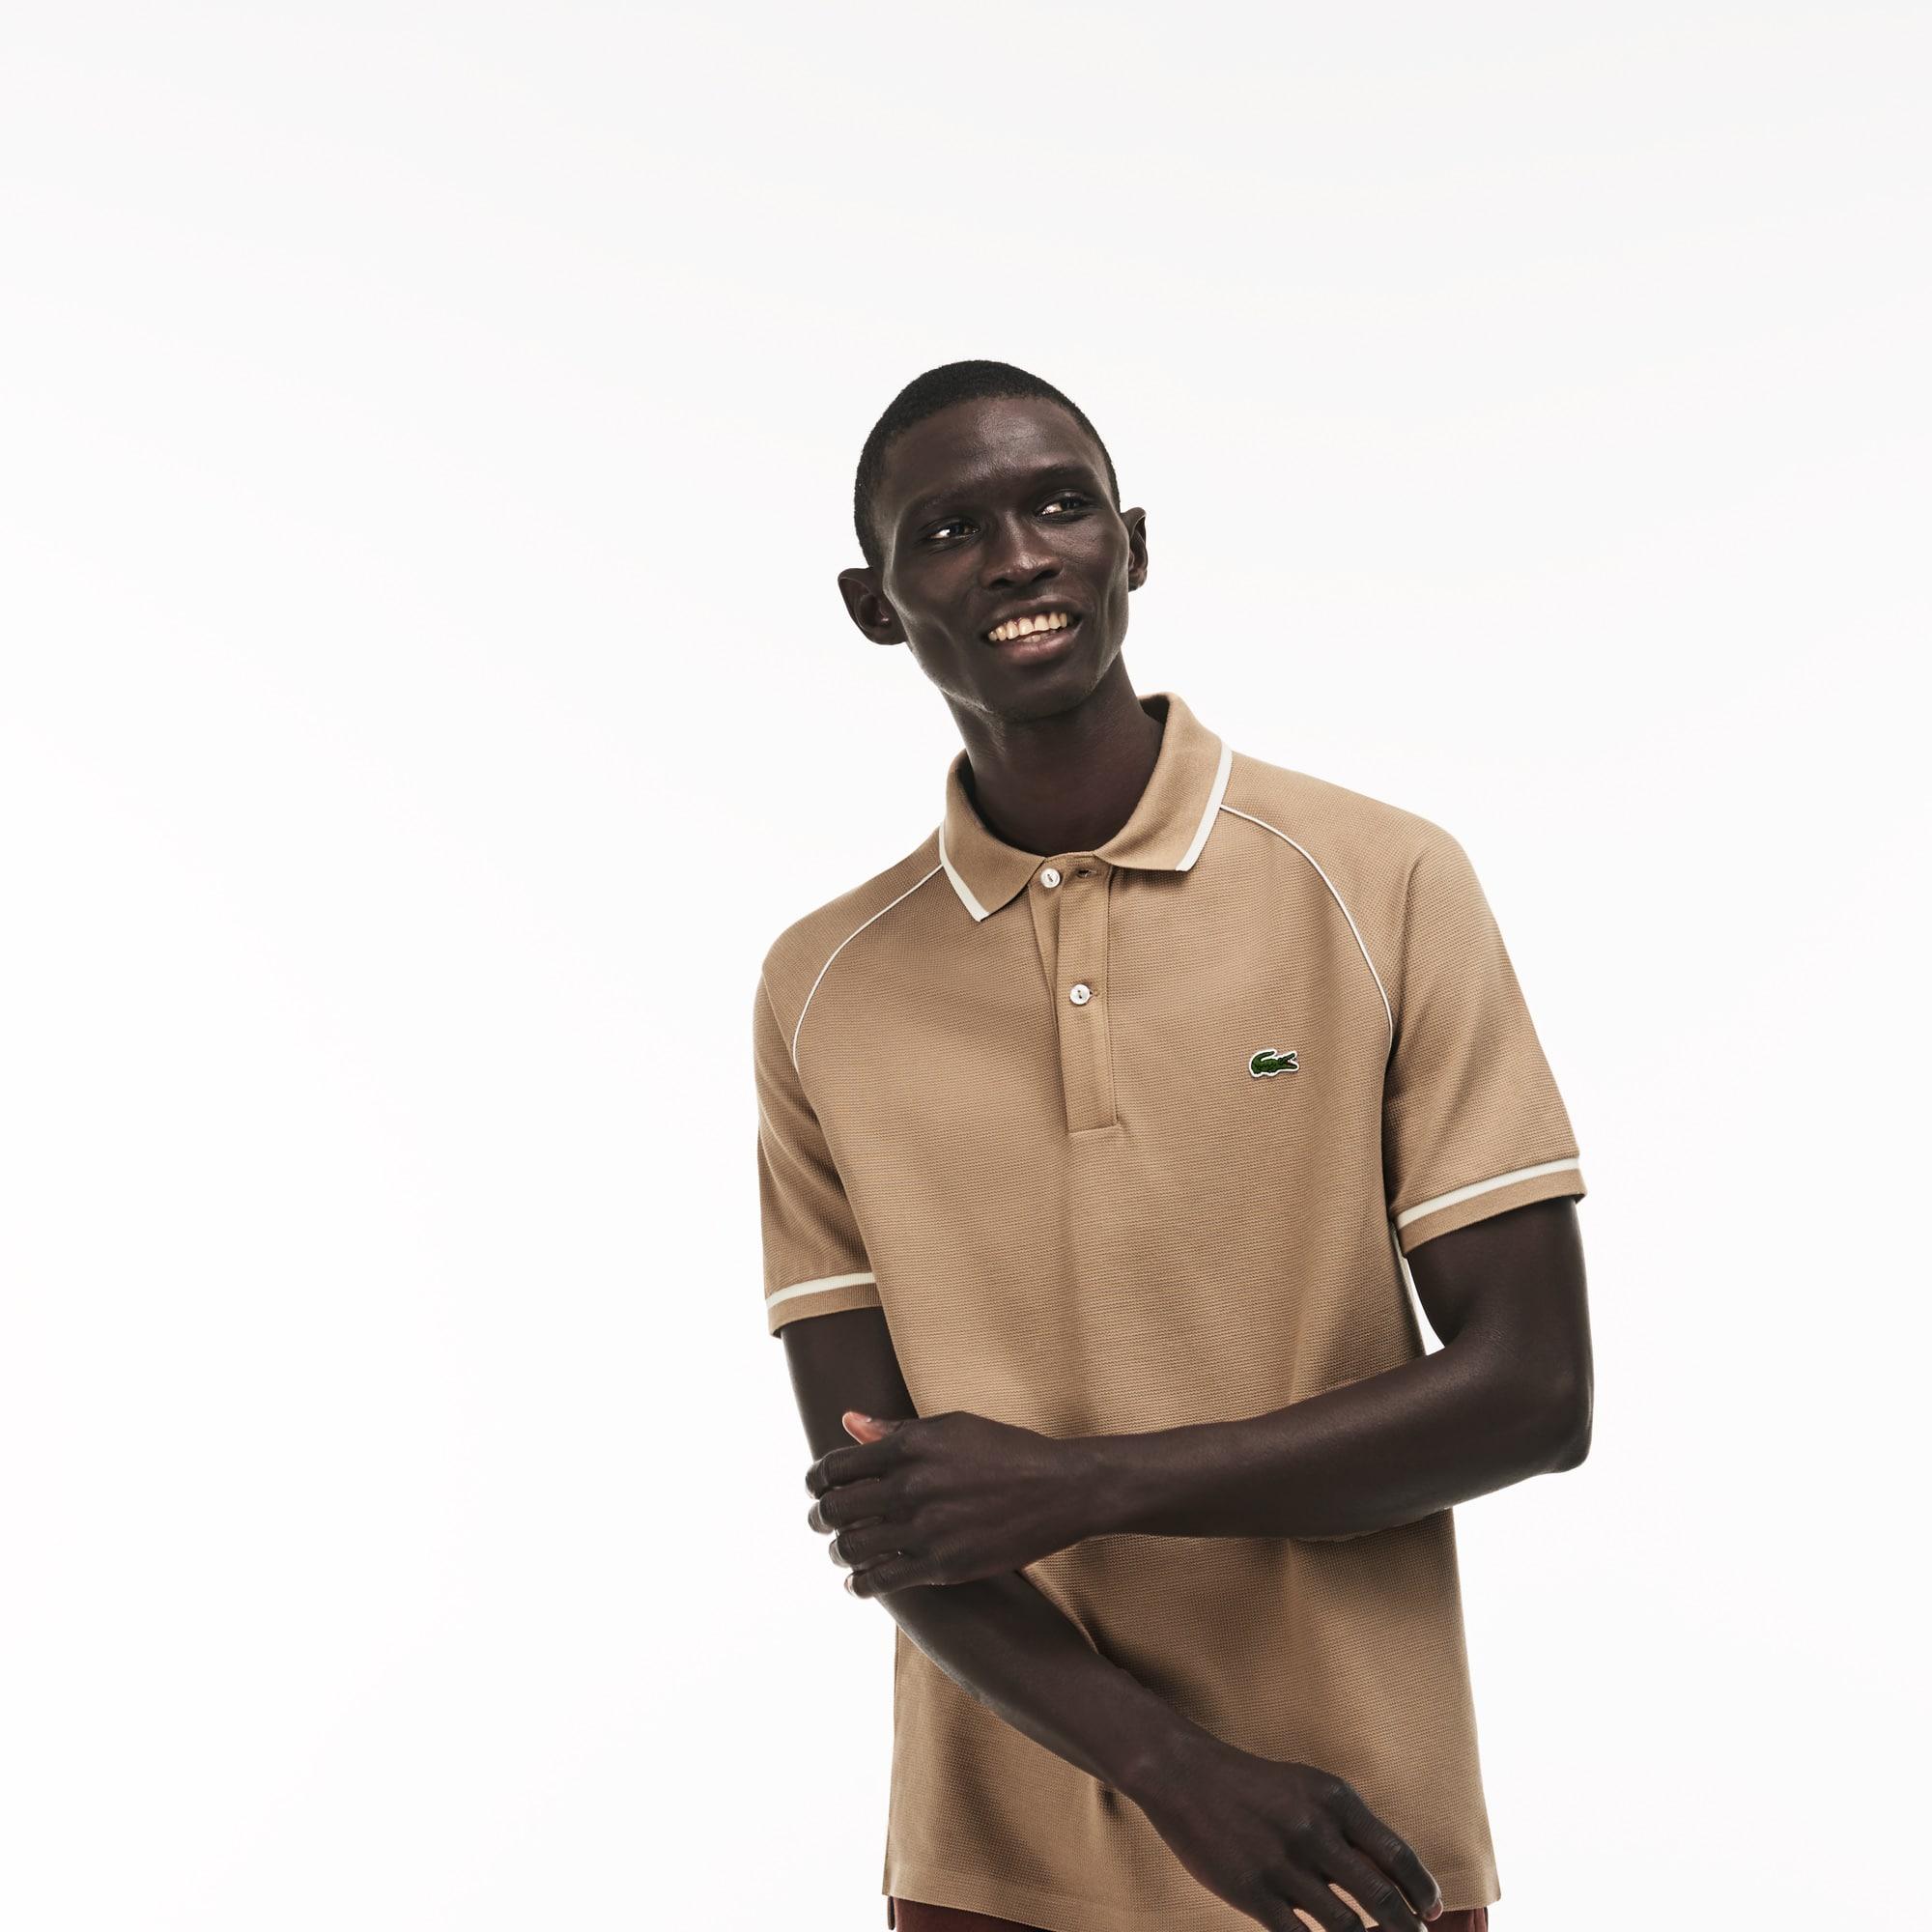 Classic Fit Herren-Poloshirt aus Strickware mit Paspeln